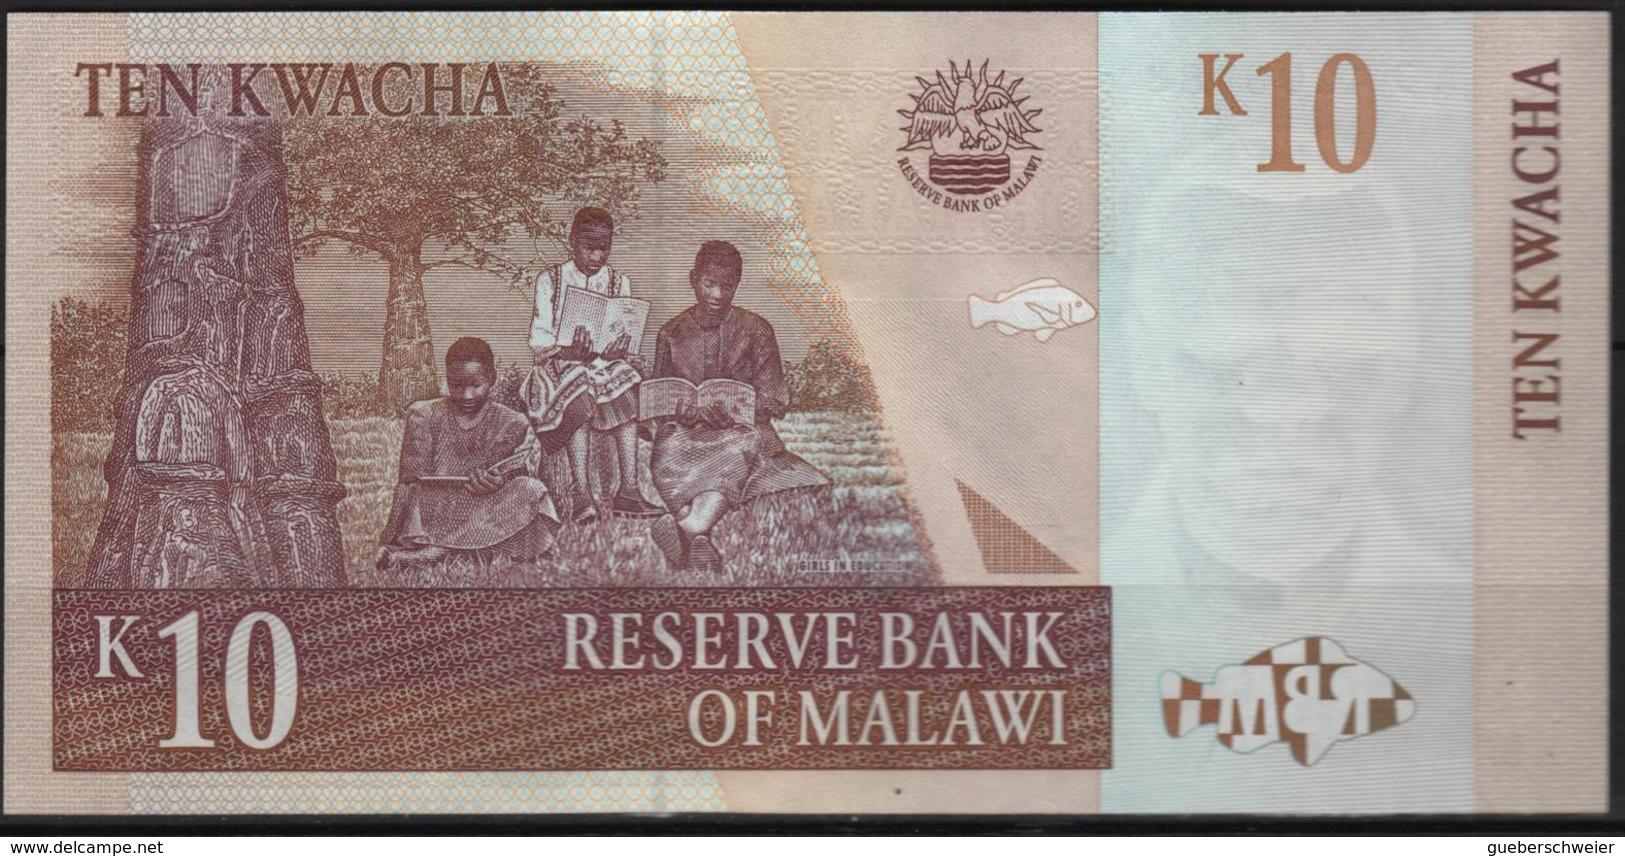 B 76 - MALAWIE Billet De 10 K état Neuf - Malawi